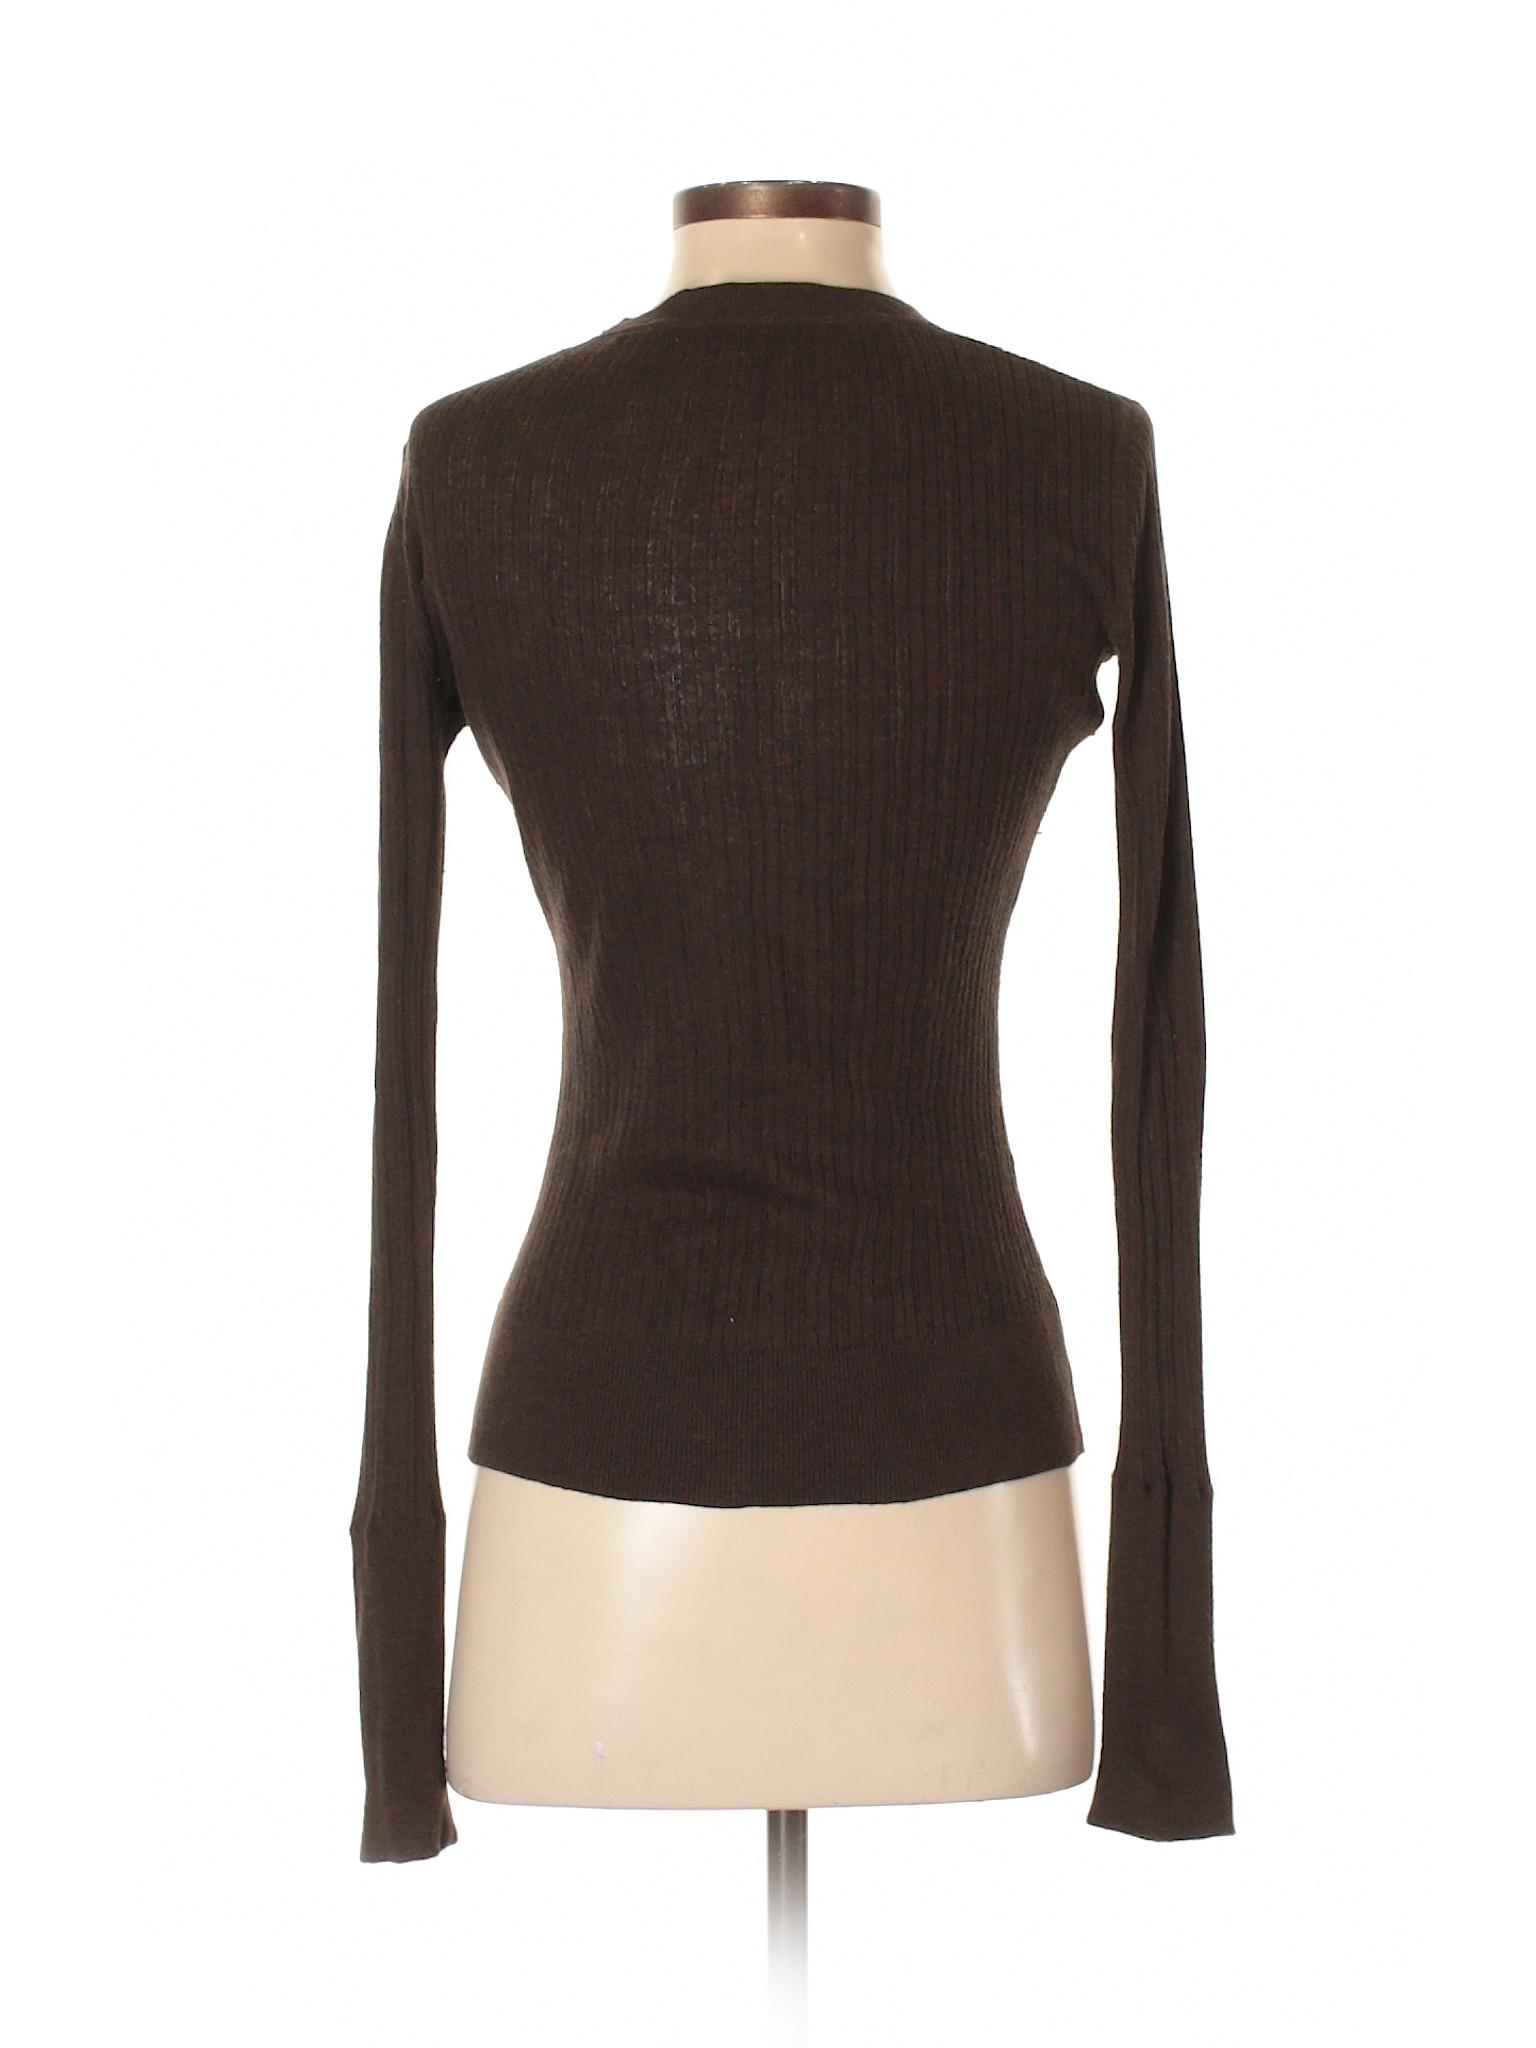 Pullover Pullover Moda Boutique International Boutique Moda Boutique Sweater Sweater International UnOxxR